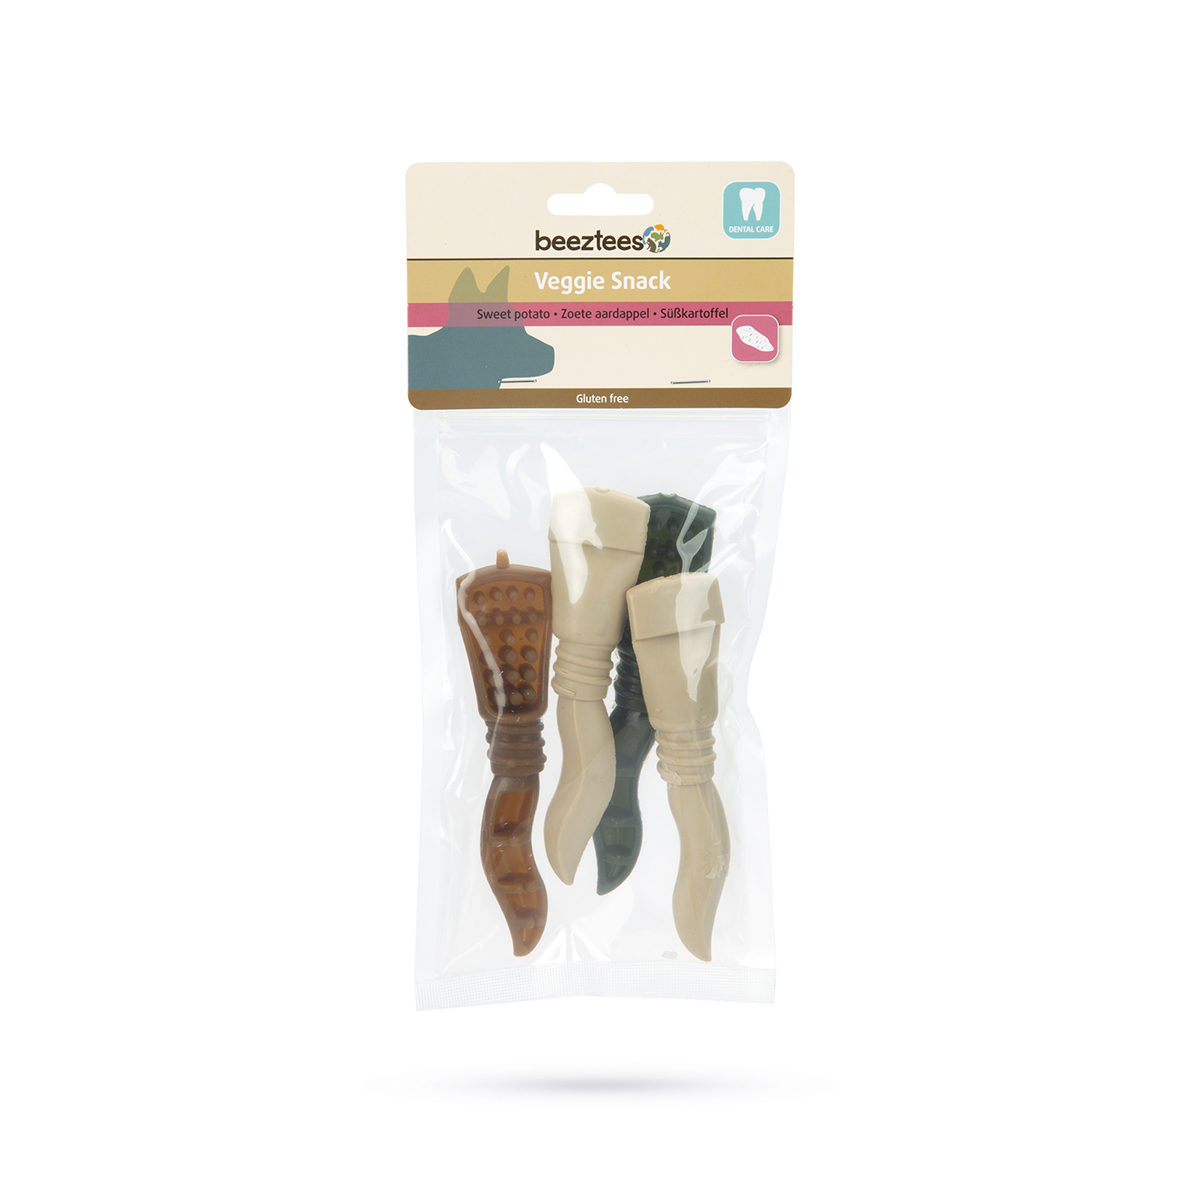 Beeztees Hondensnack Veggie Tandpasta Mix 4 x 13cm